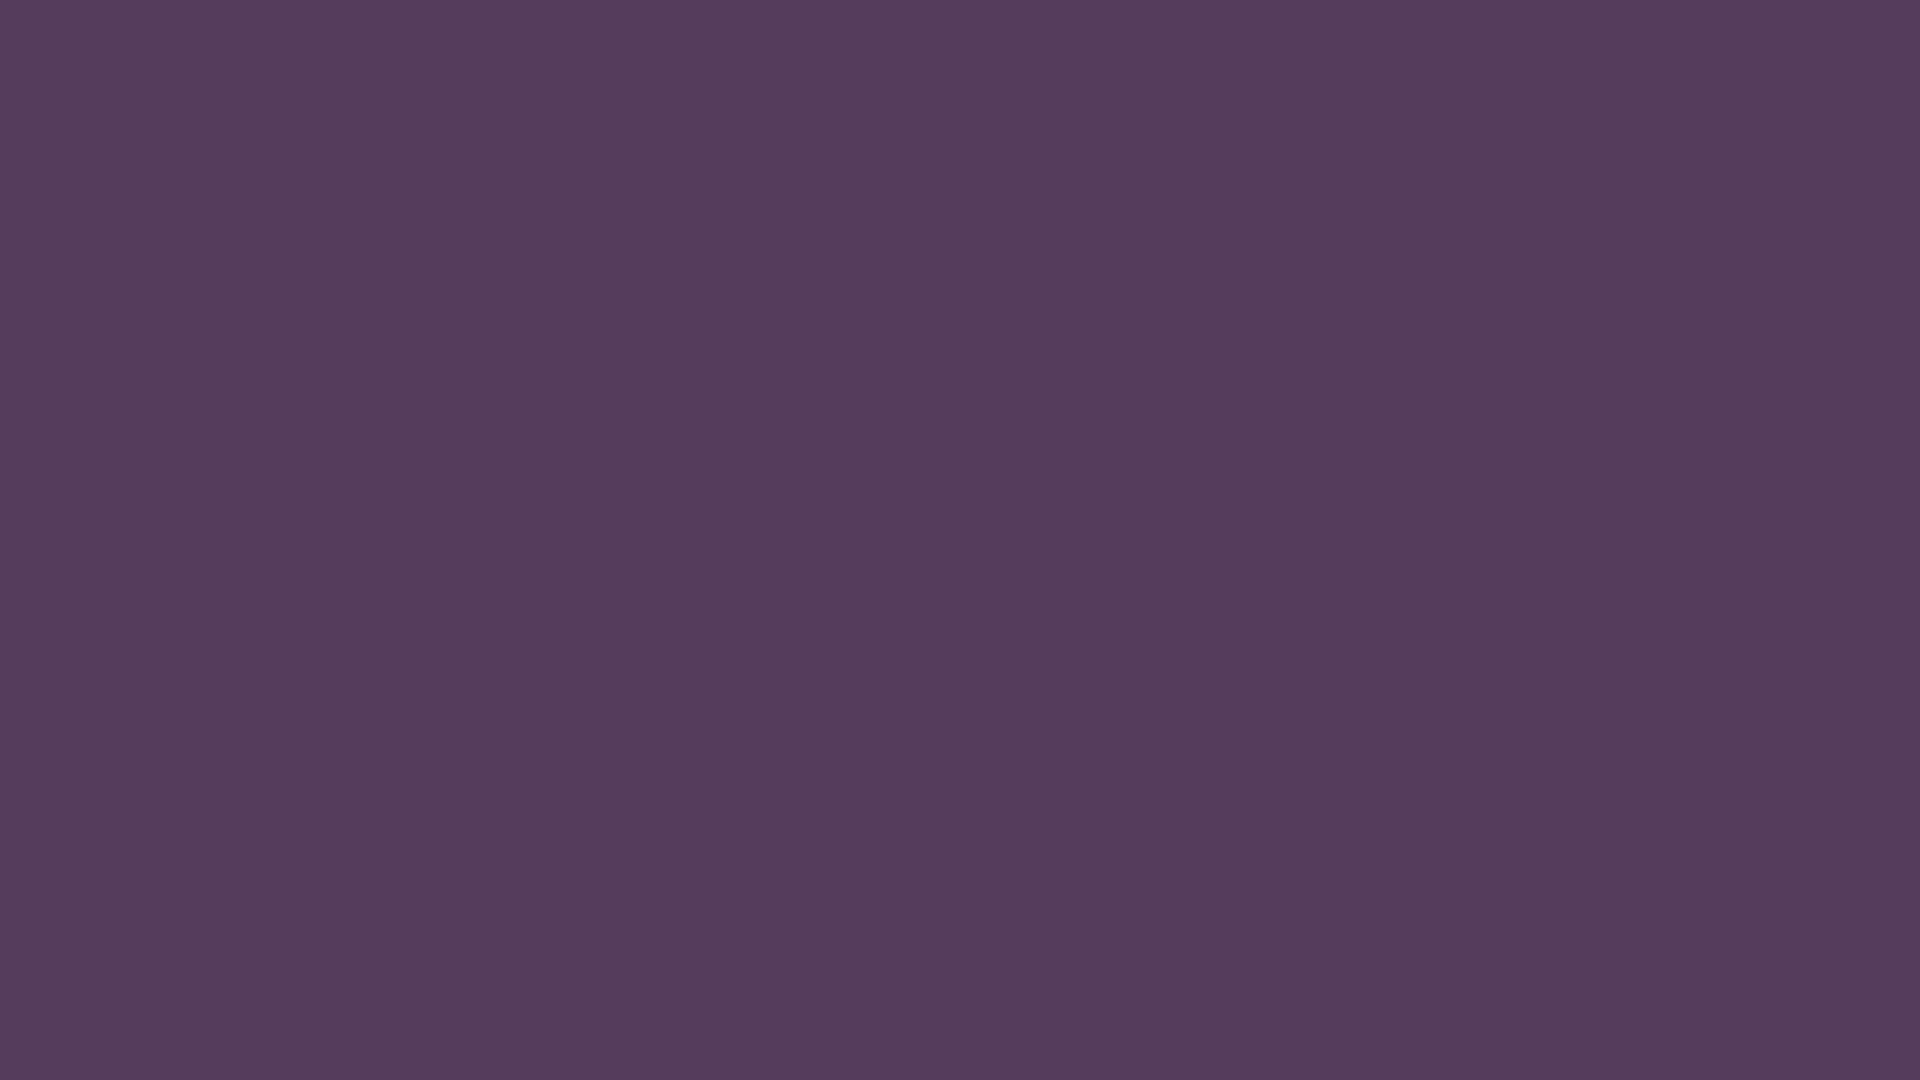 1920x1080 English Violet Solid Color Background